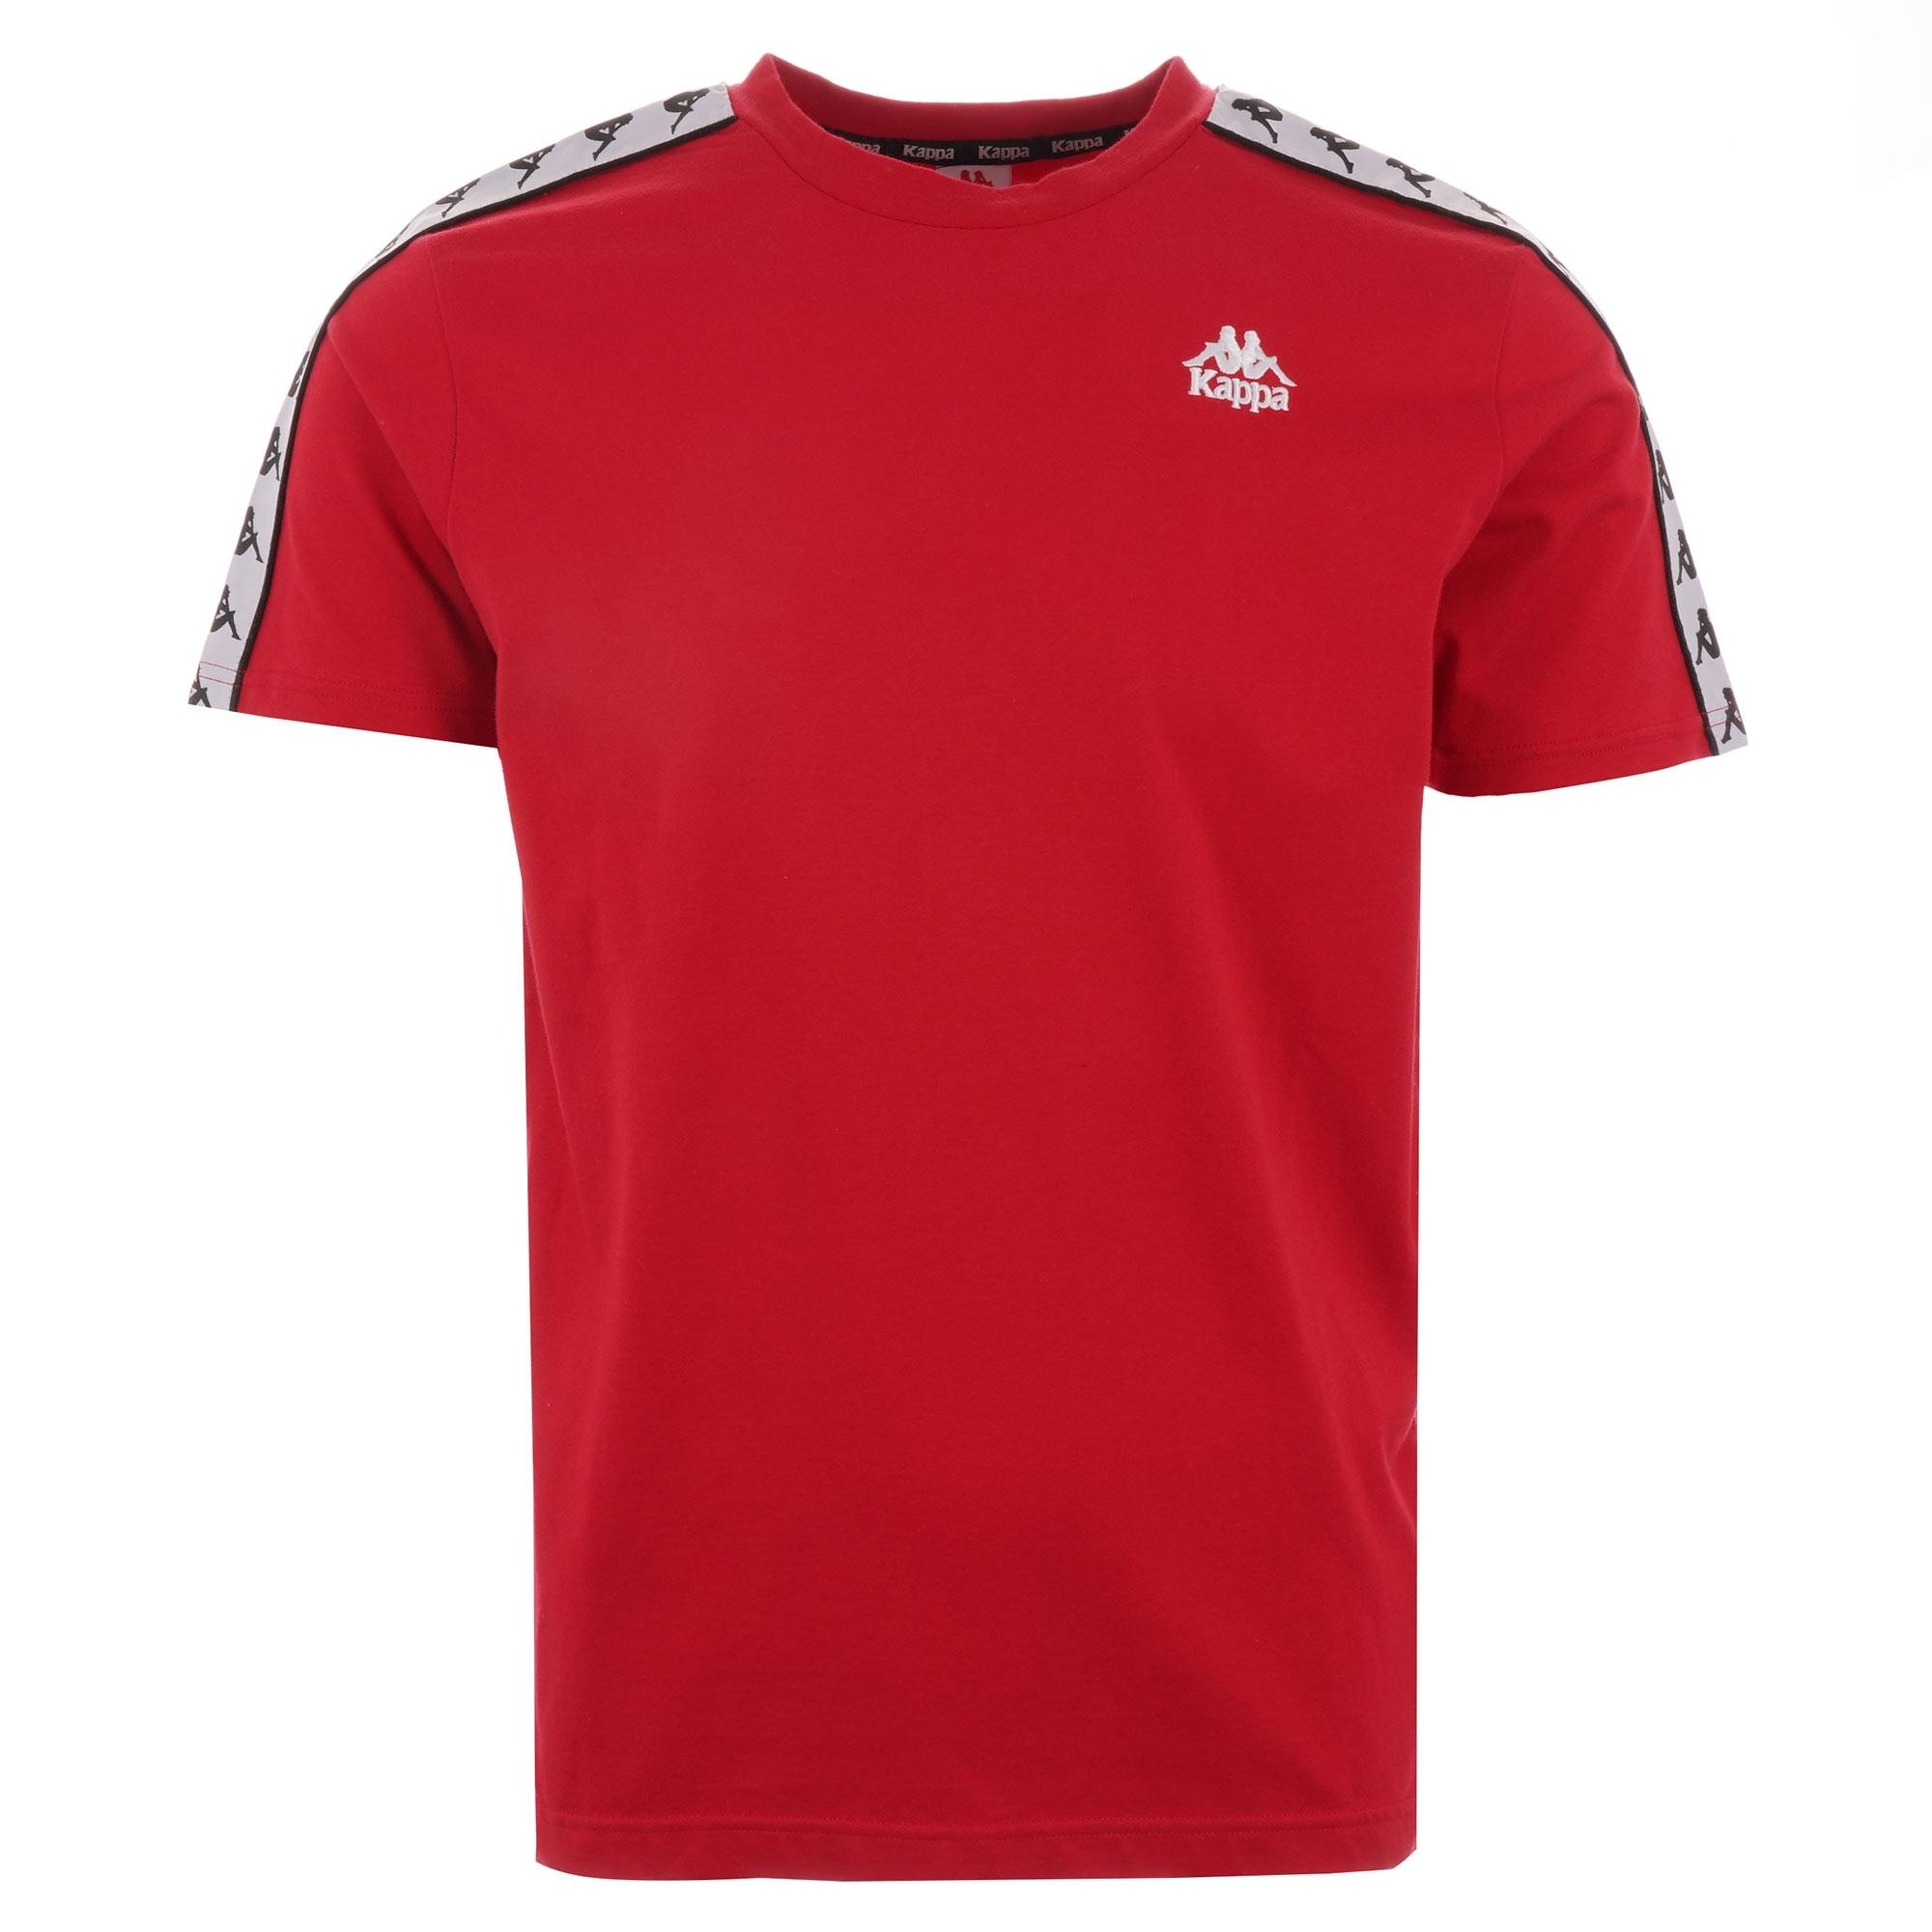 apretón Escarchado Agotamiento  Kappa 222 Banda Charlton T-Shirt | Red | 304KPR0